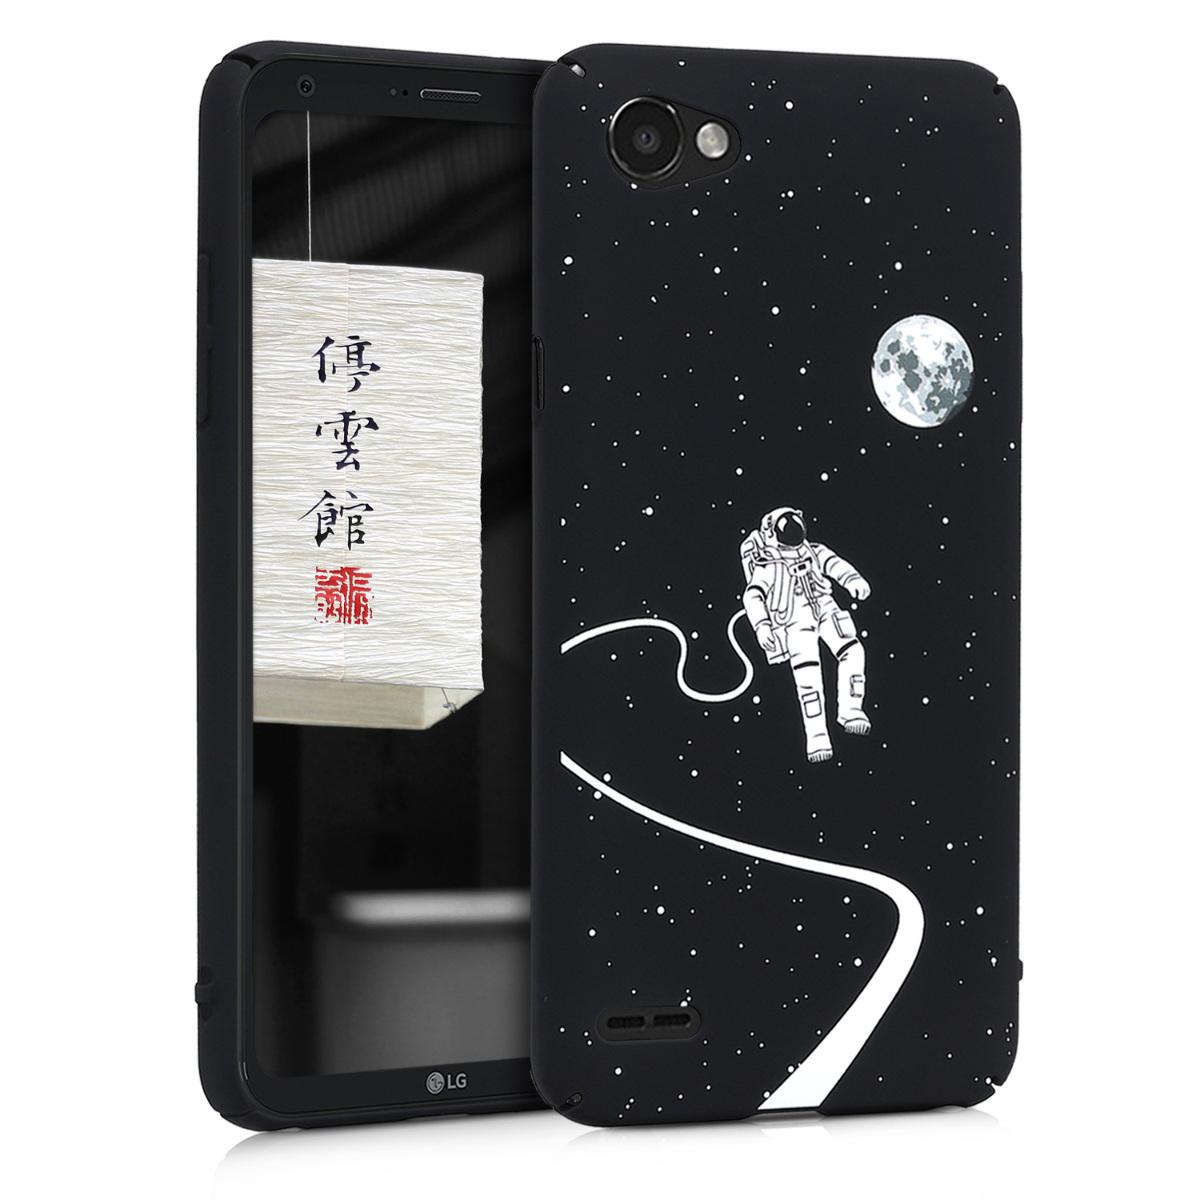 KW Slim Anti-Slip Cover - Σκληρή Θήκη Καουτσούκ LG Q6 - Μαύρο - Αστροναύτης (44085.02)